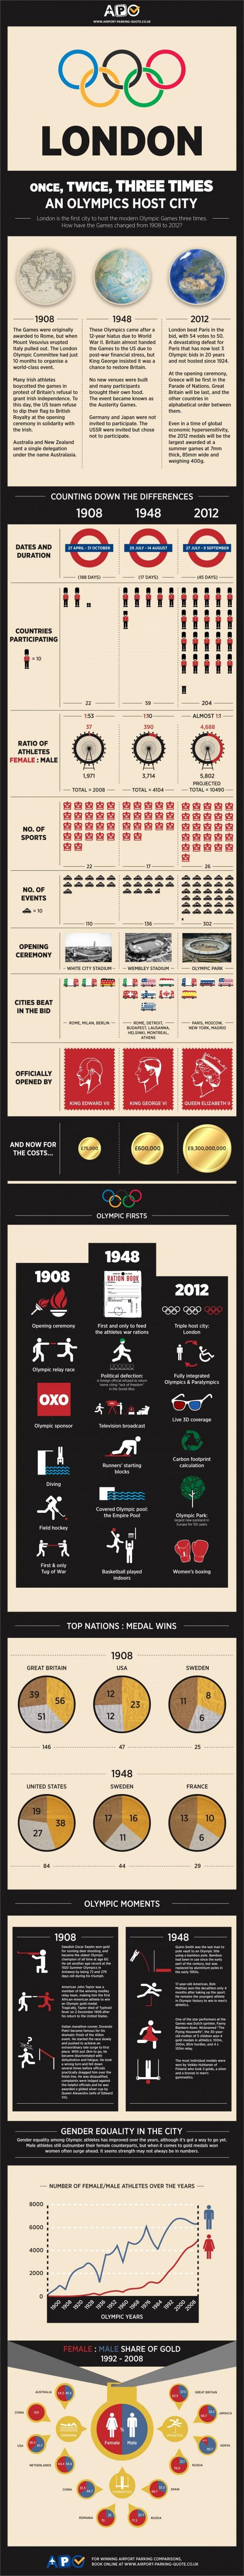 london olympics infographic 560x5917